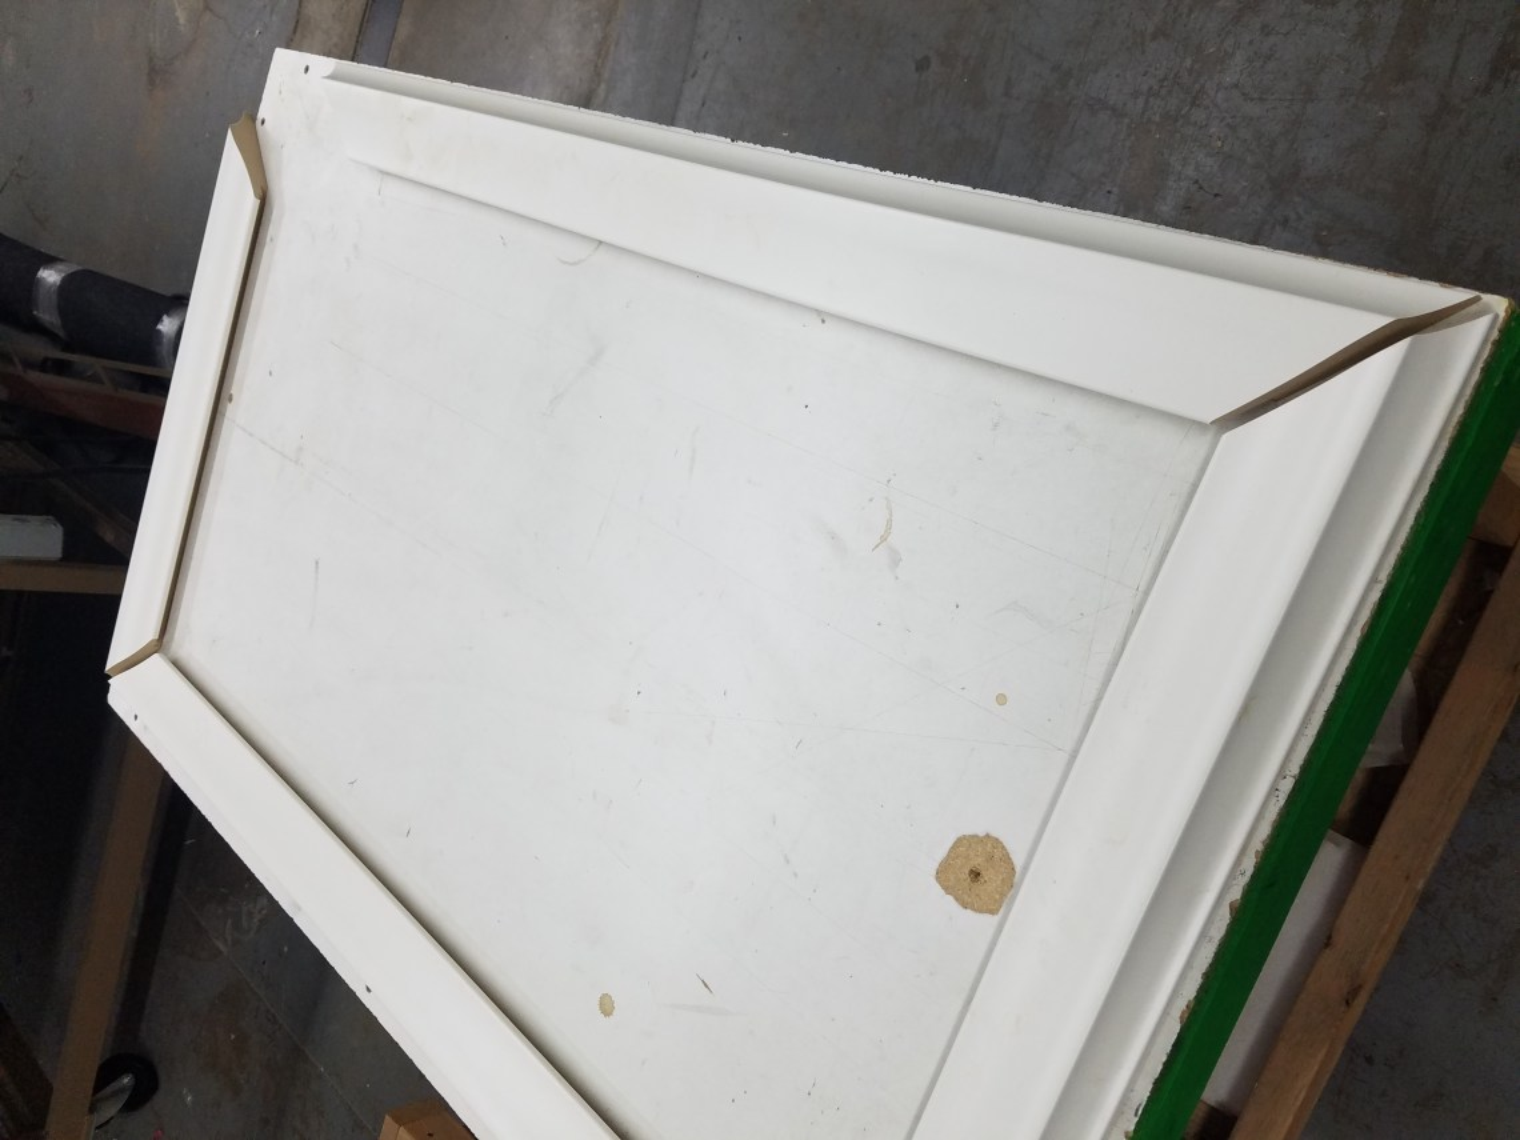 Double check and glue mirror tv frame sticks